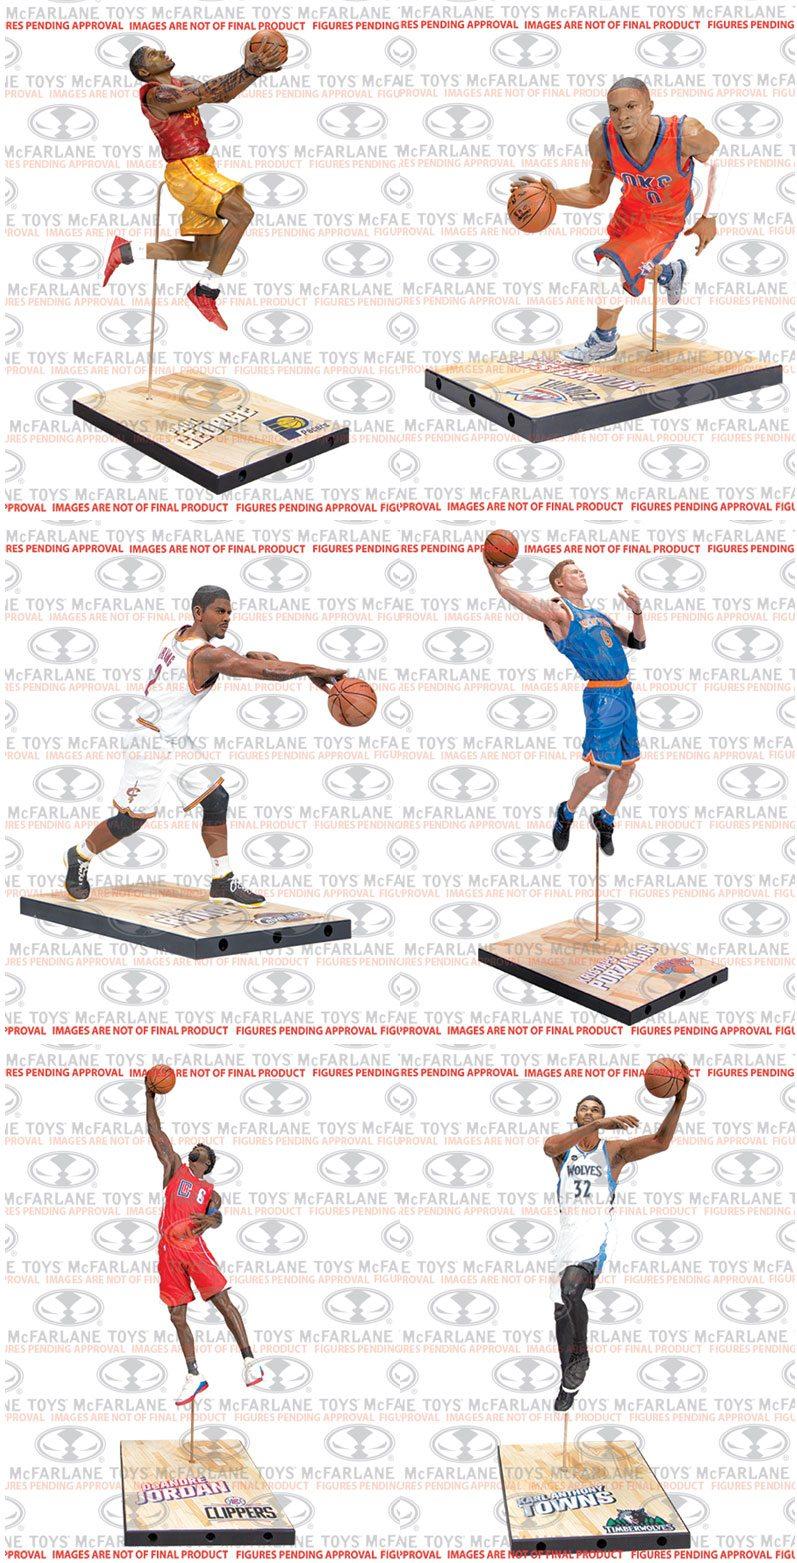 NBA Basketball Action Figures 15 cm Series 29 Assortment (8)